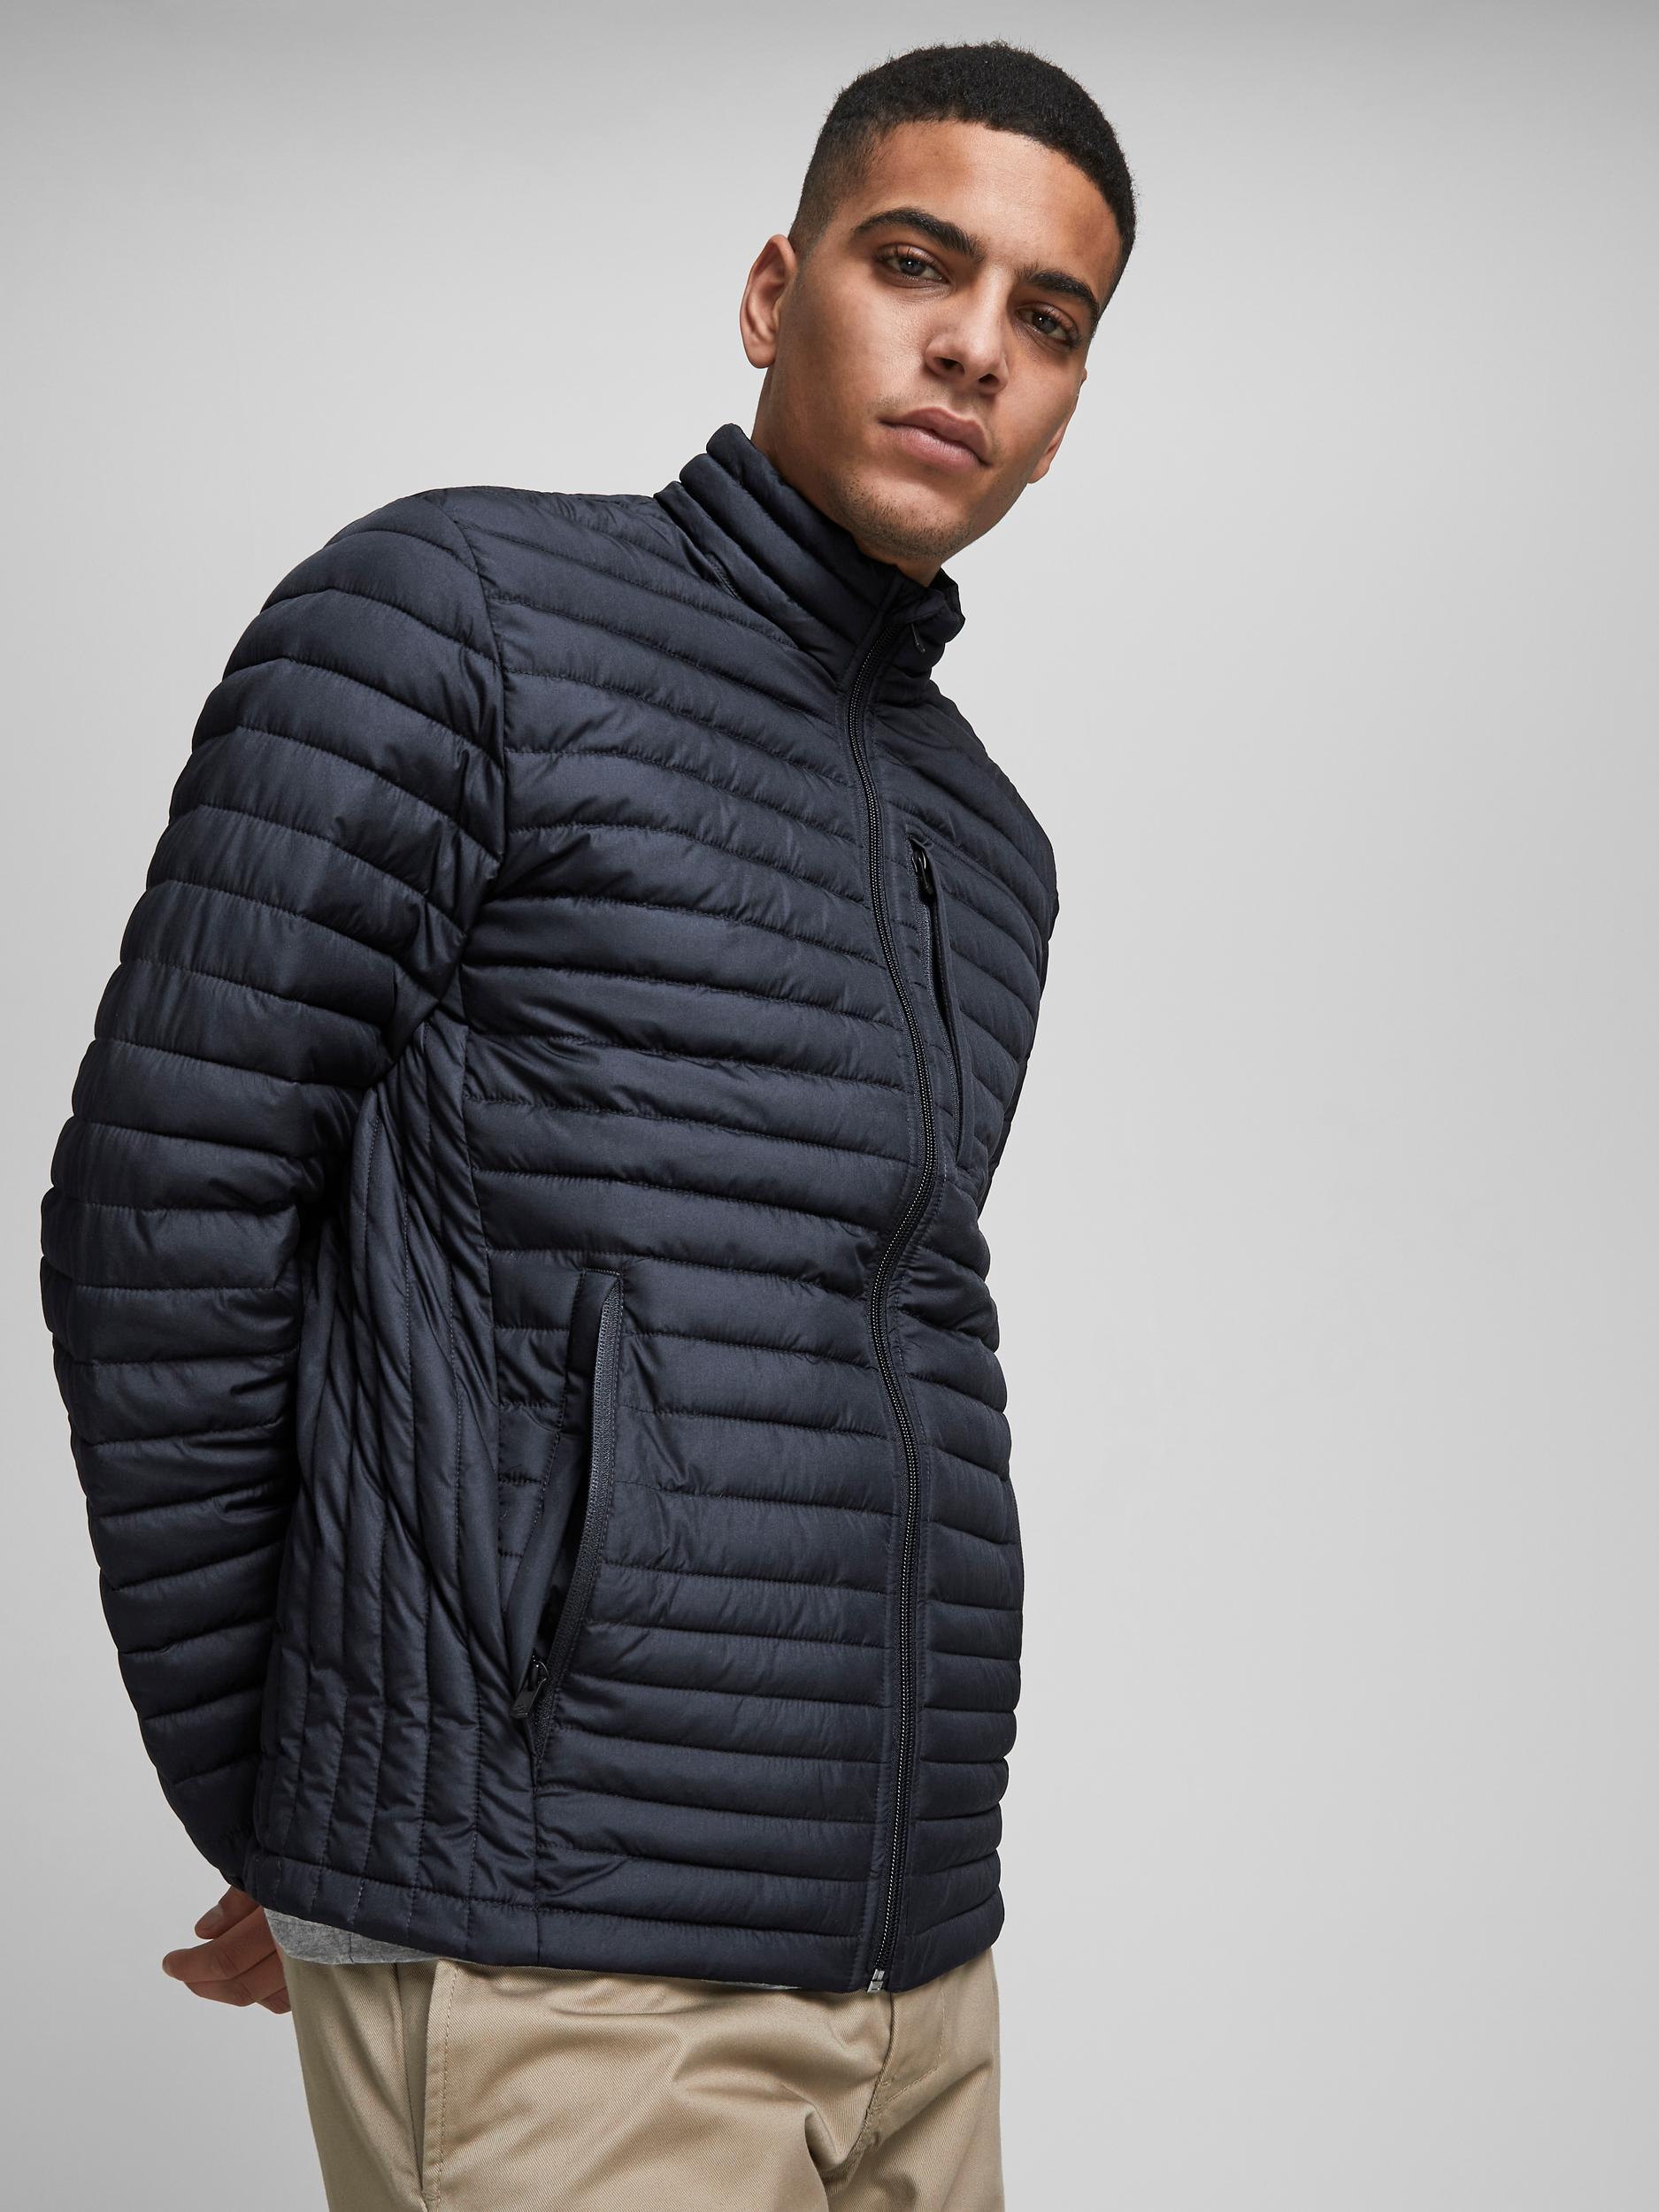 Jack & Jones Ensfarvet jakke, dark navy, large